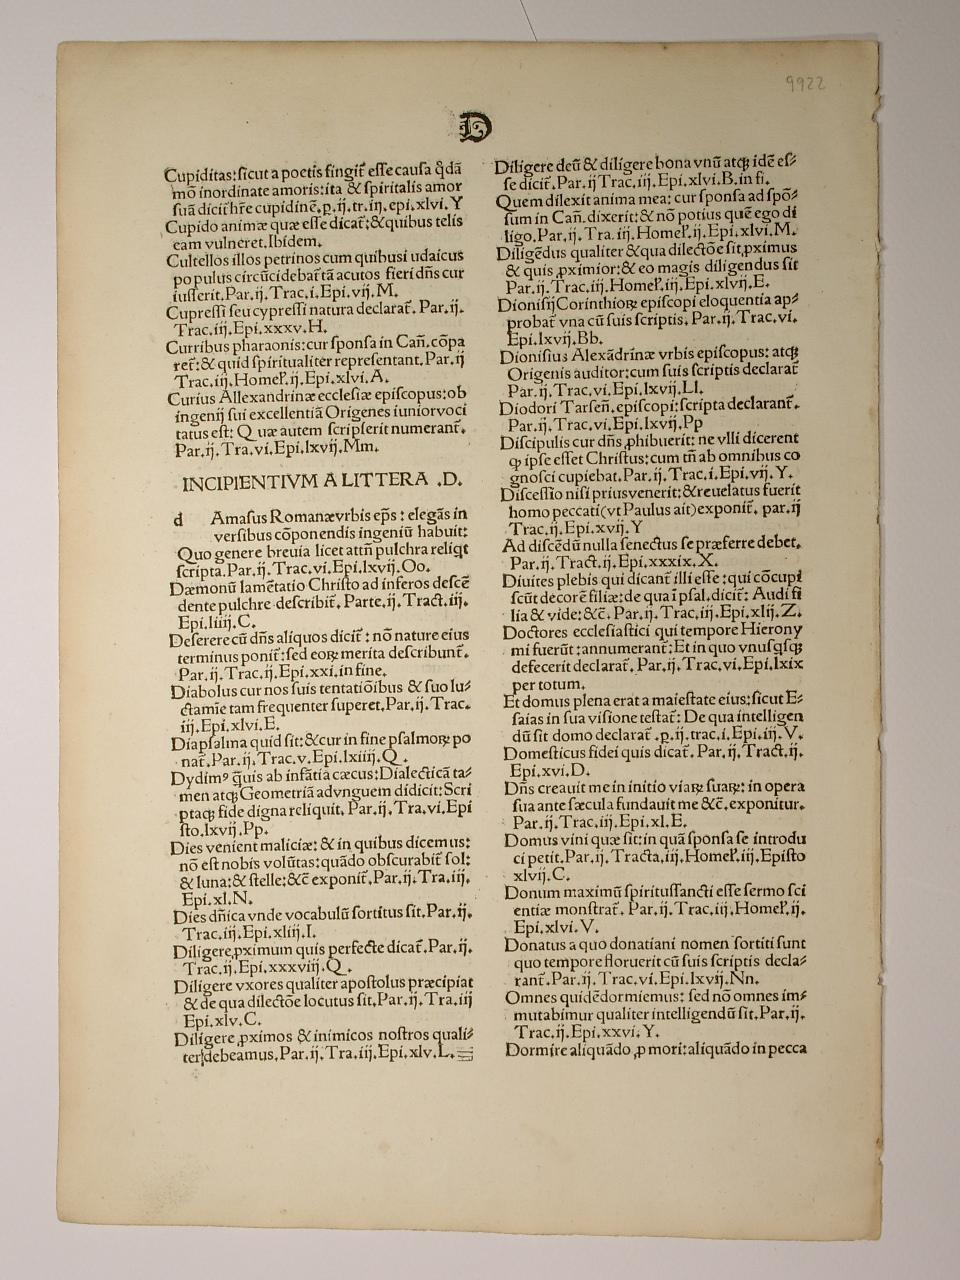 Epistolae. Pars II. (GW 12436, HC 8565).: Sophronius Eusebius Hieronymus: